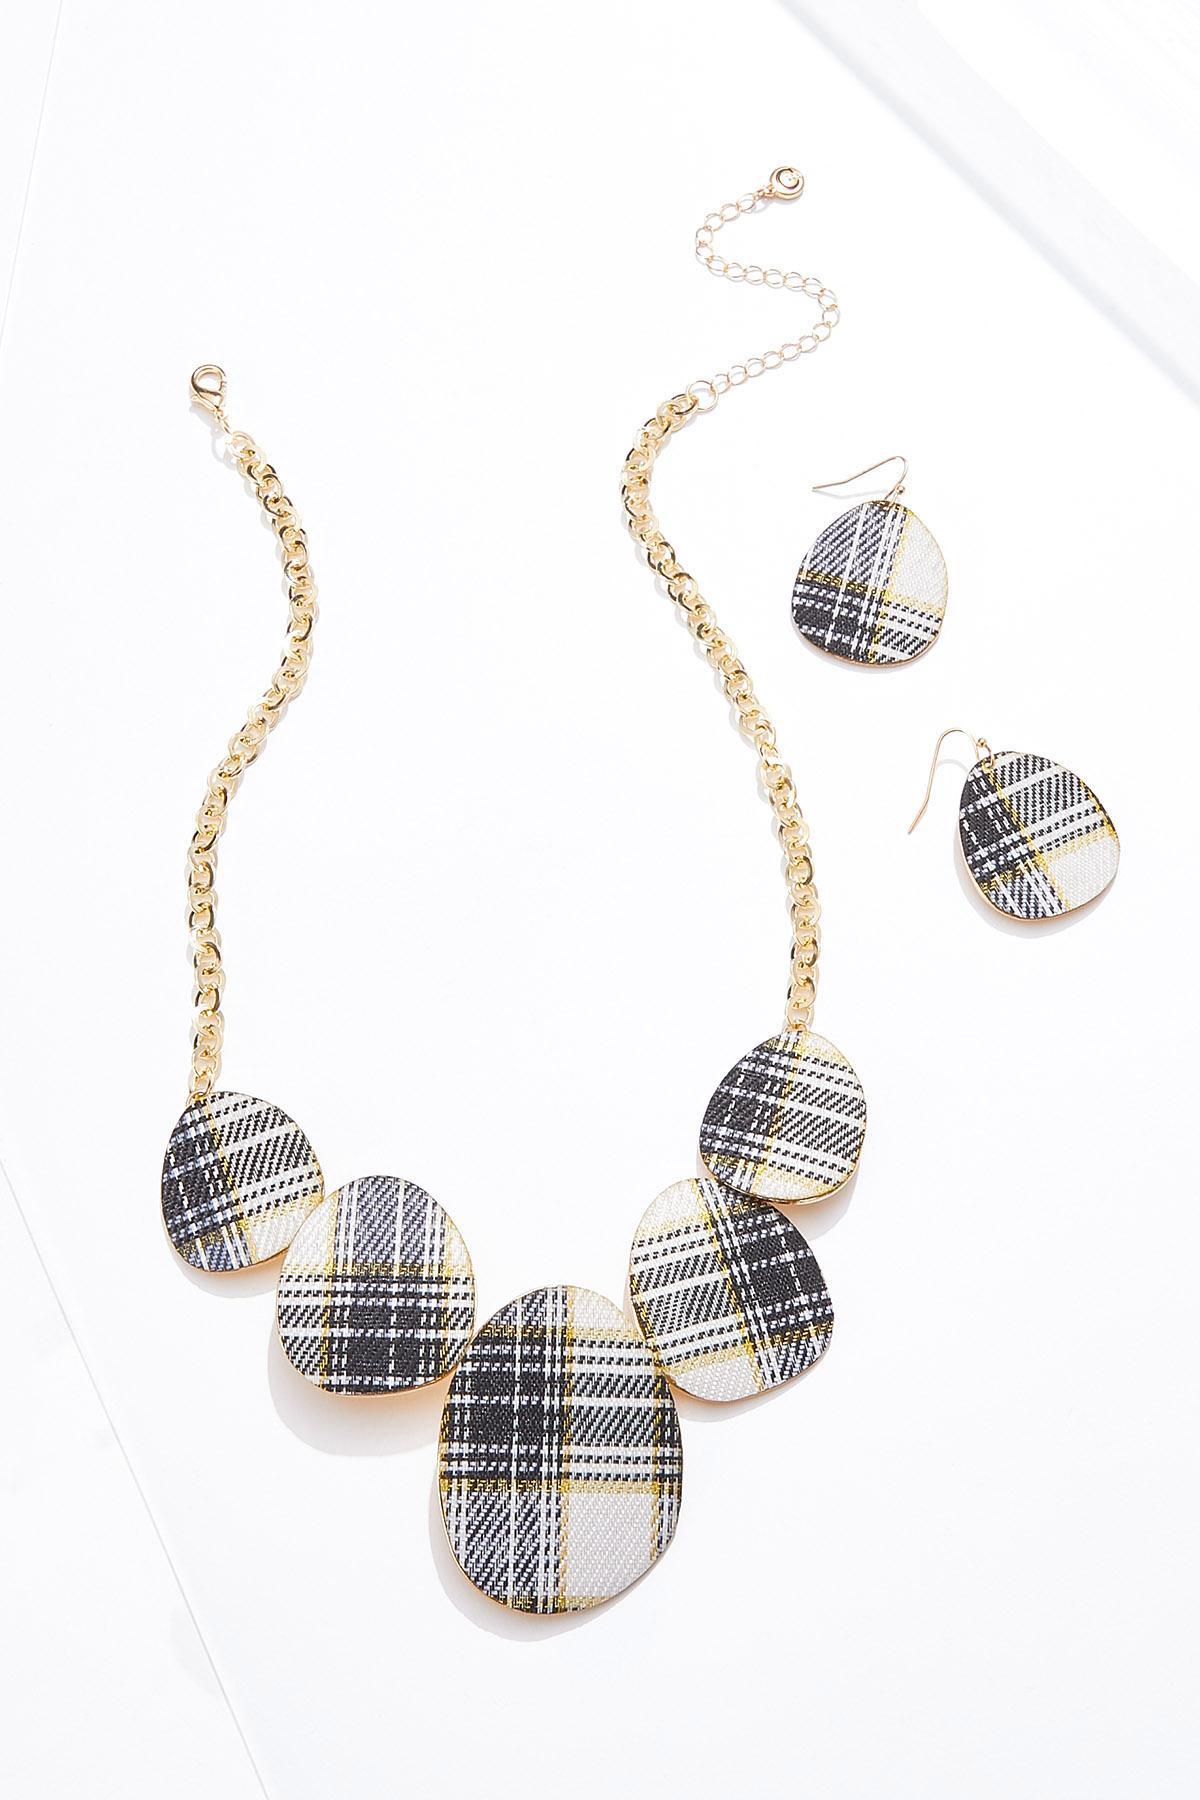 Plaid Faux Leather Necklace Earring Set